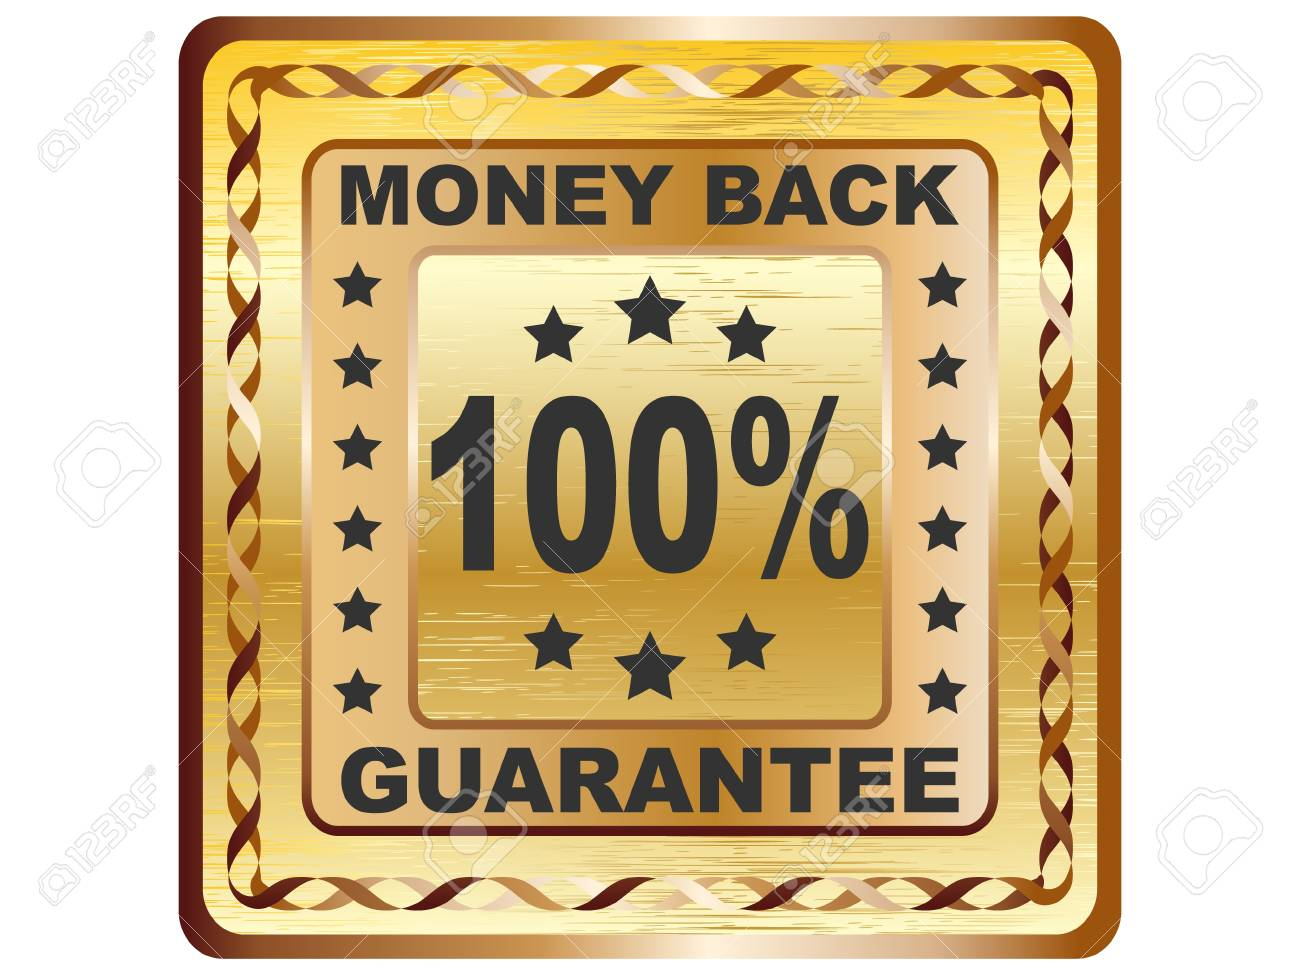 100 % GUARANTEE label vector illustration Stock Vector - 10740637